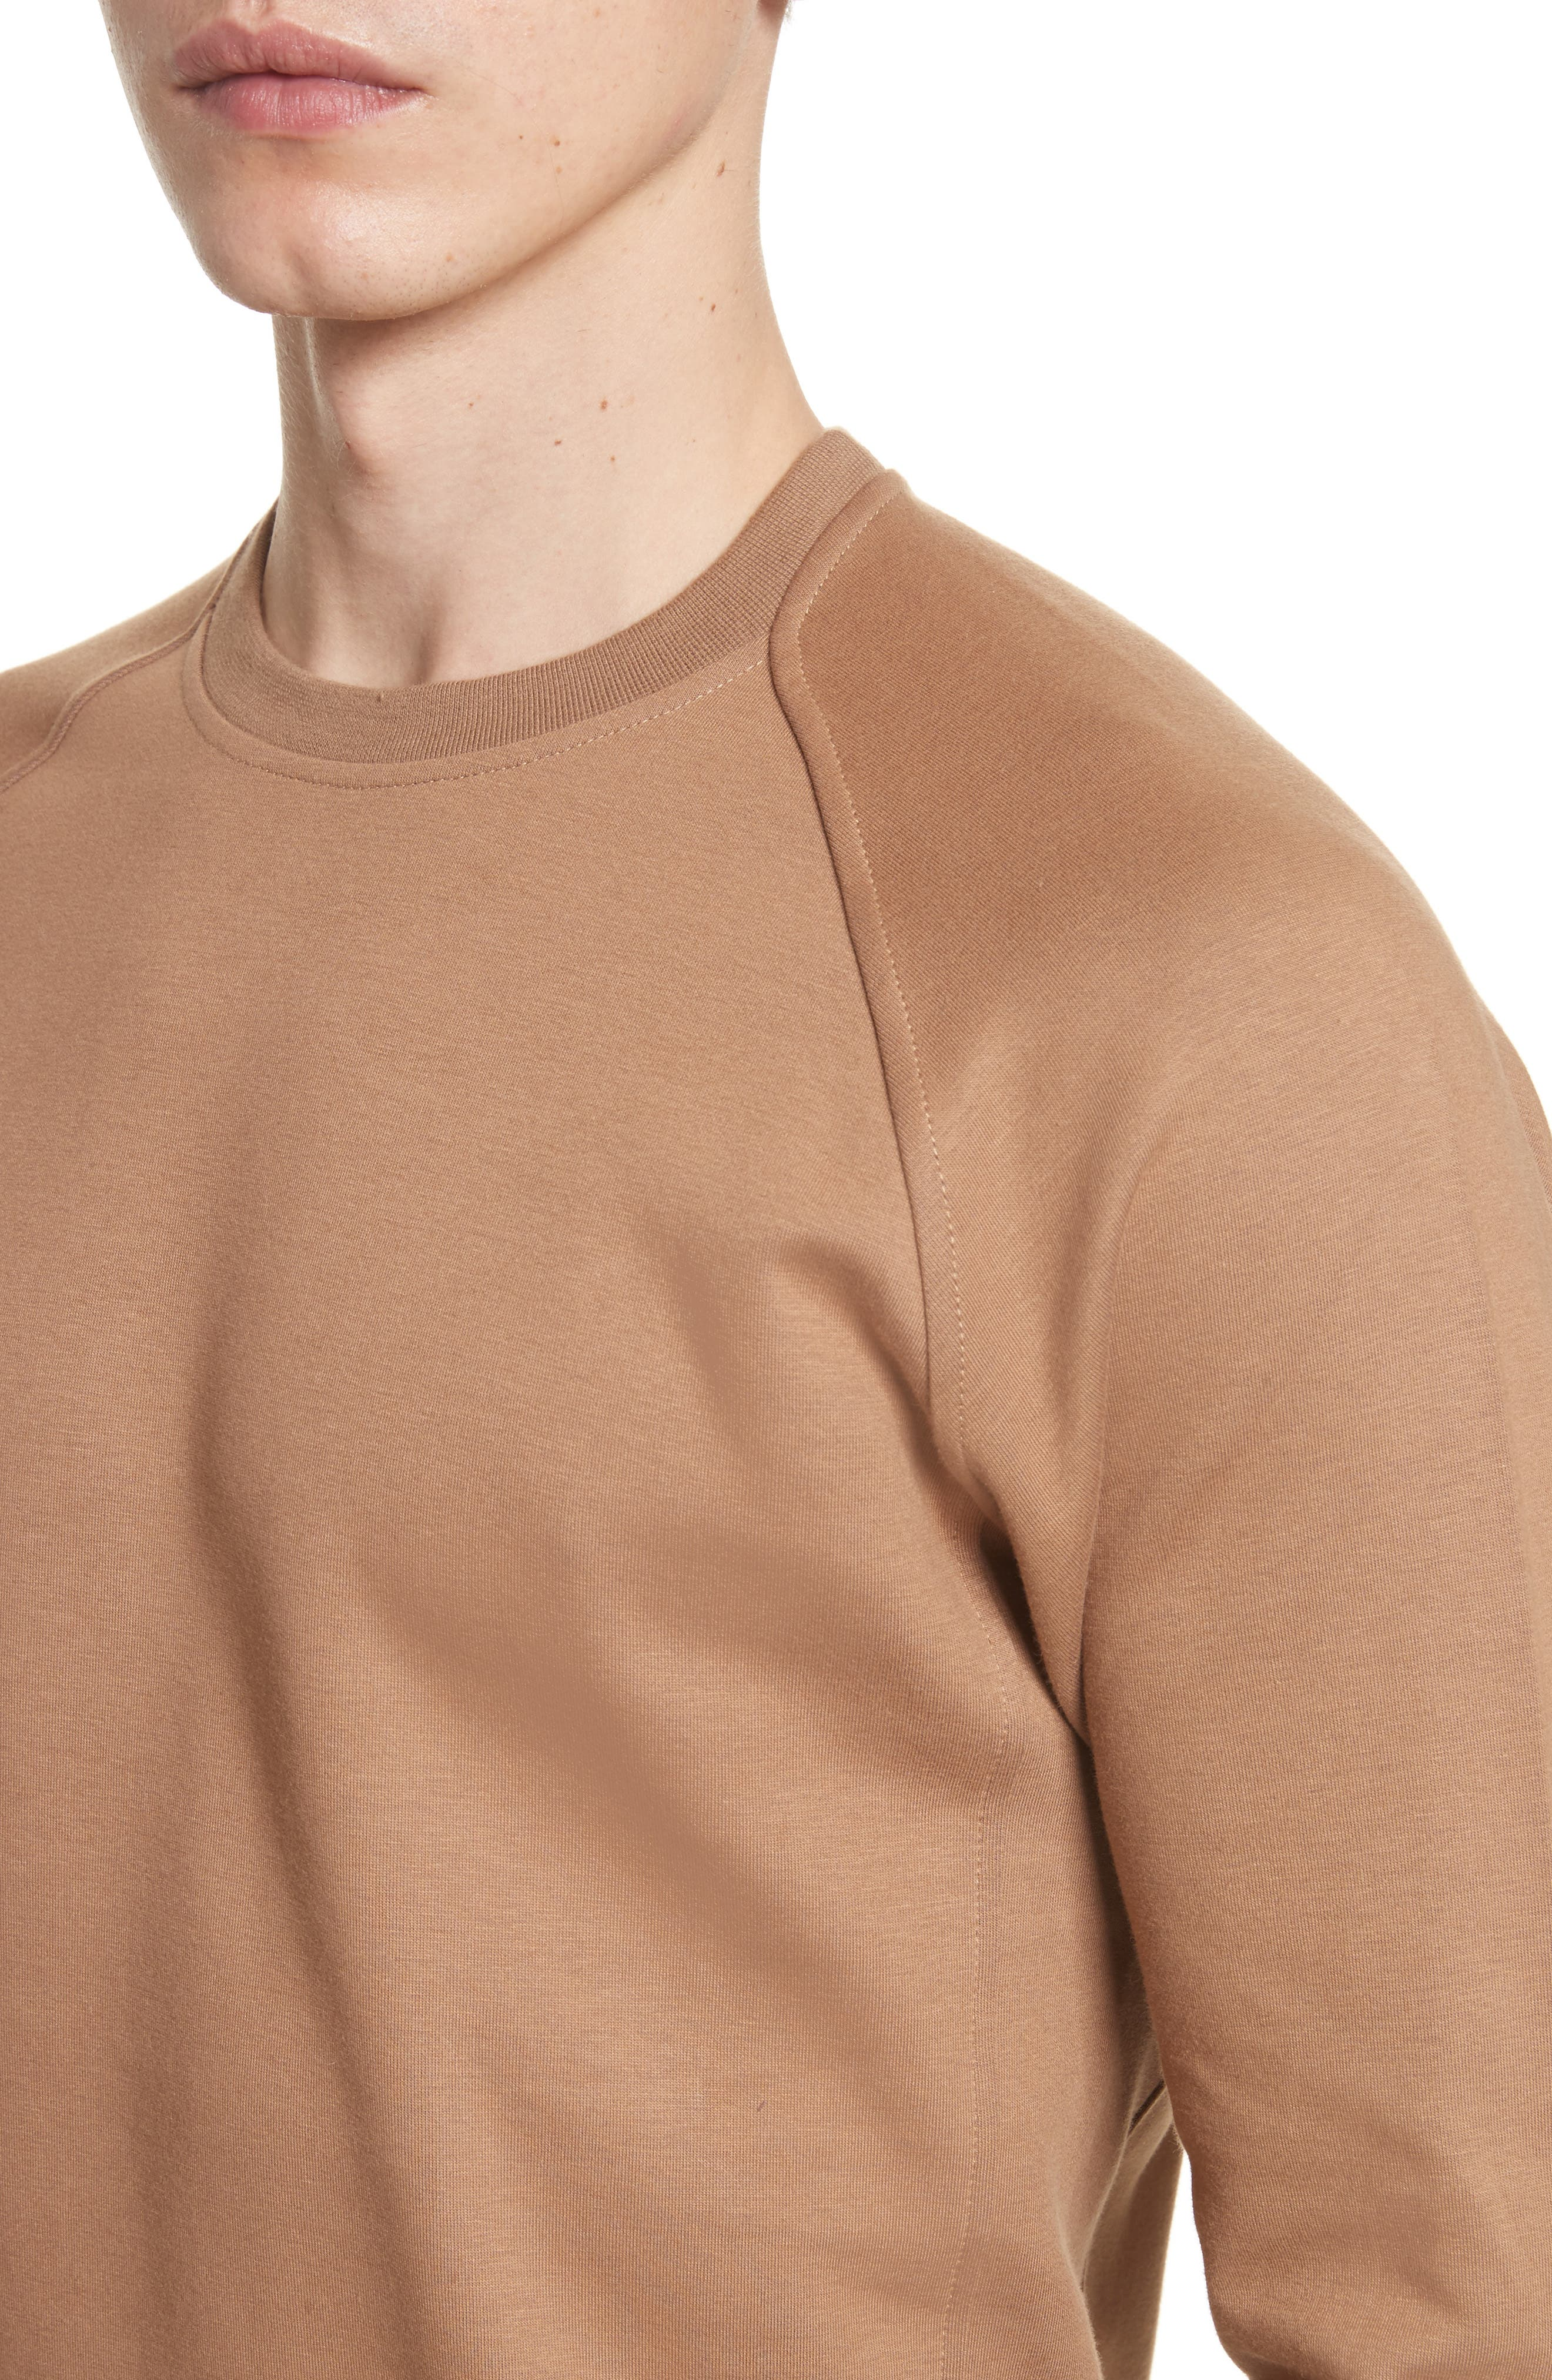 Ketel Dry Mercerized Crewneck Sweatshirt,                             Alternate thumbnail 4, color,                             251